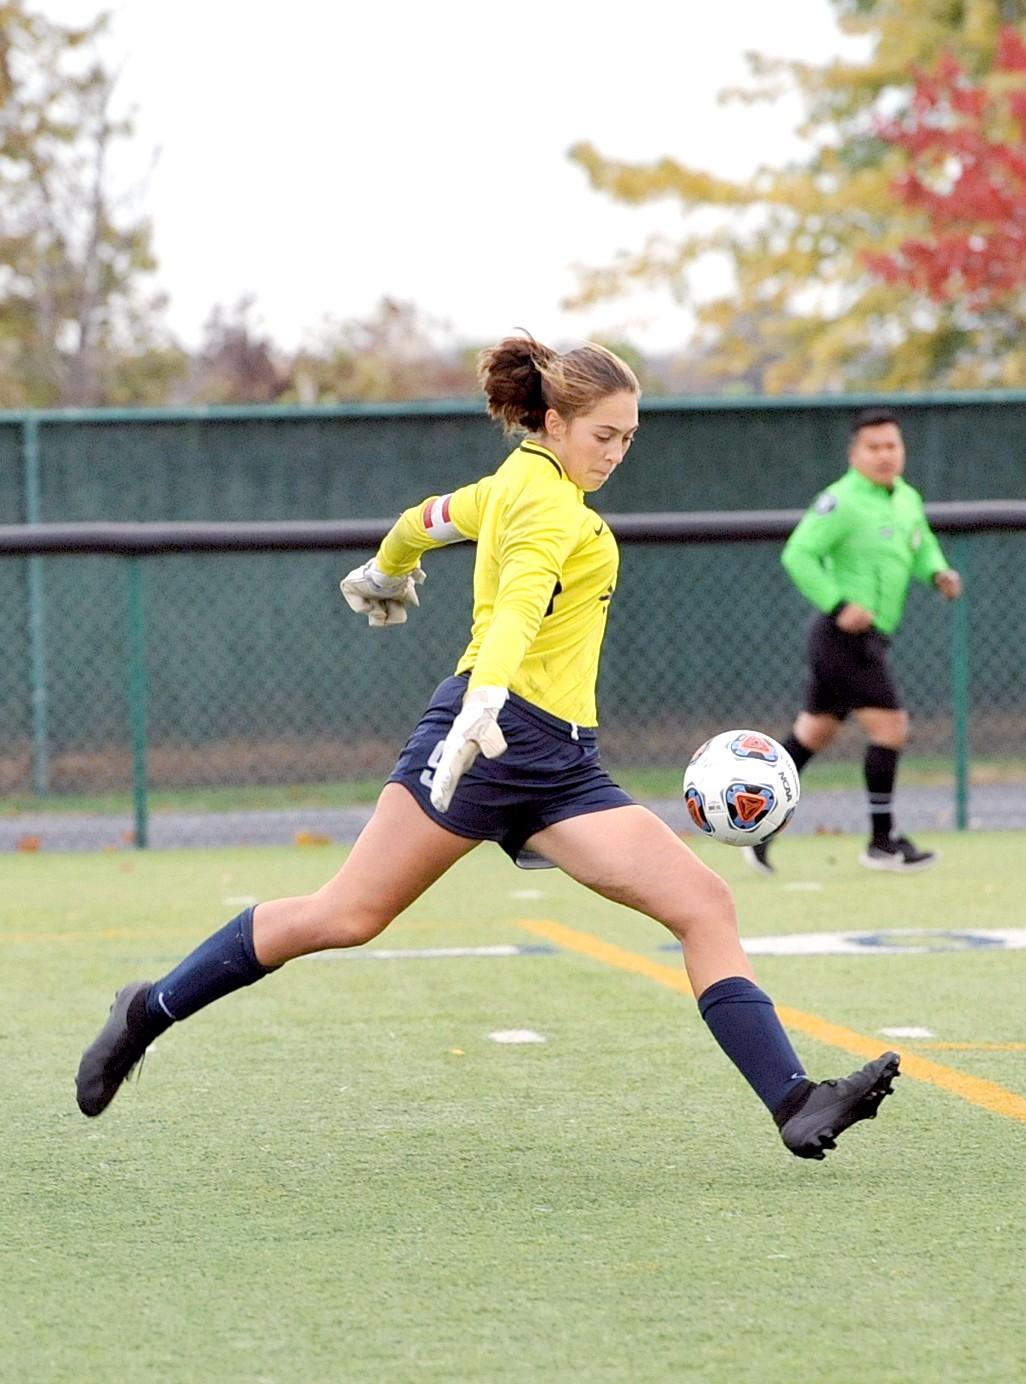 Lake junior goalkeeper Brigid Enright. (Photo by LifeTouch courtesy Lake Schools)